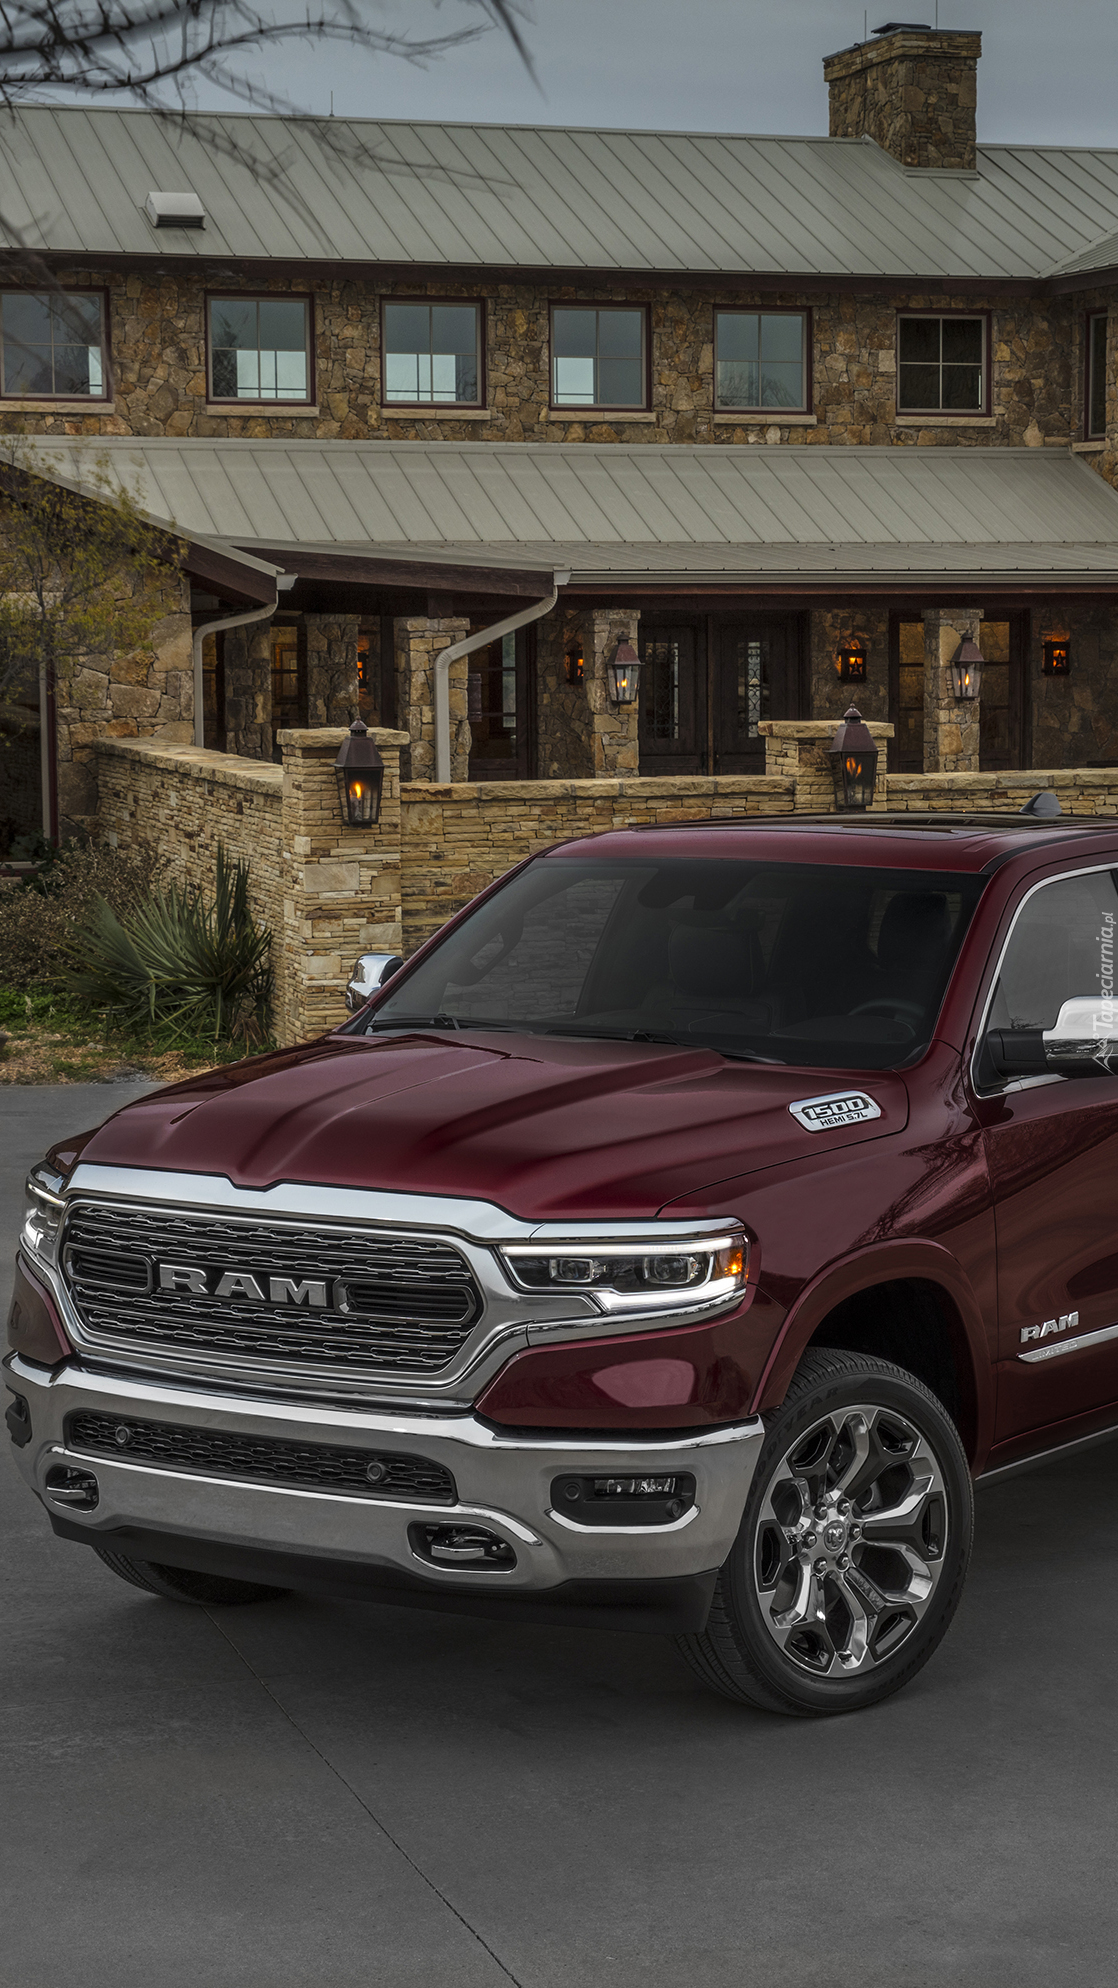 Przód Dodge Ram 1500 Pickup